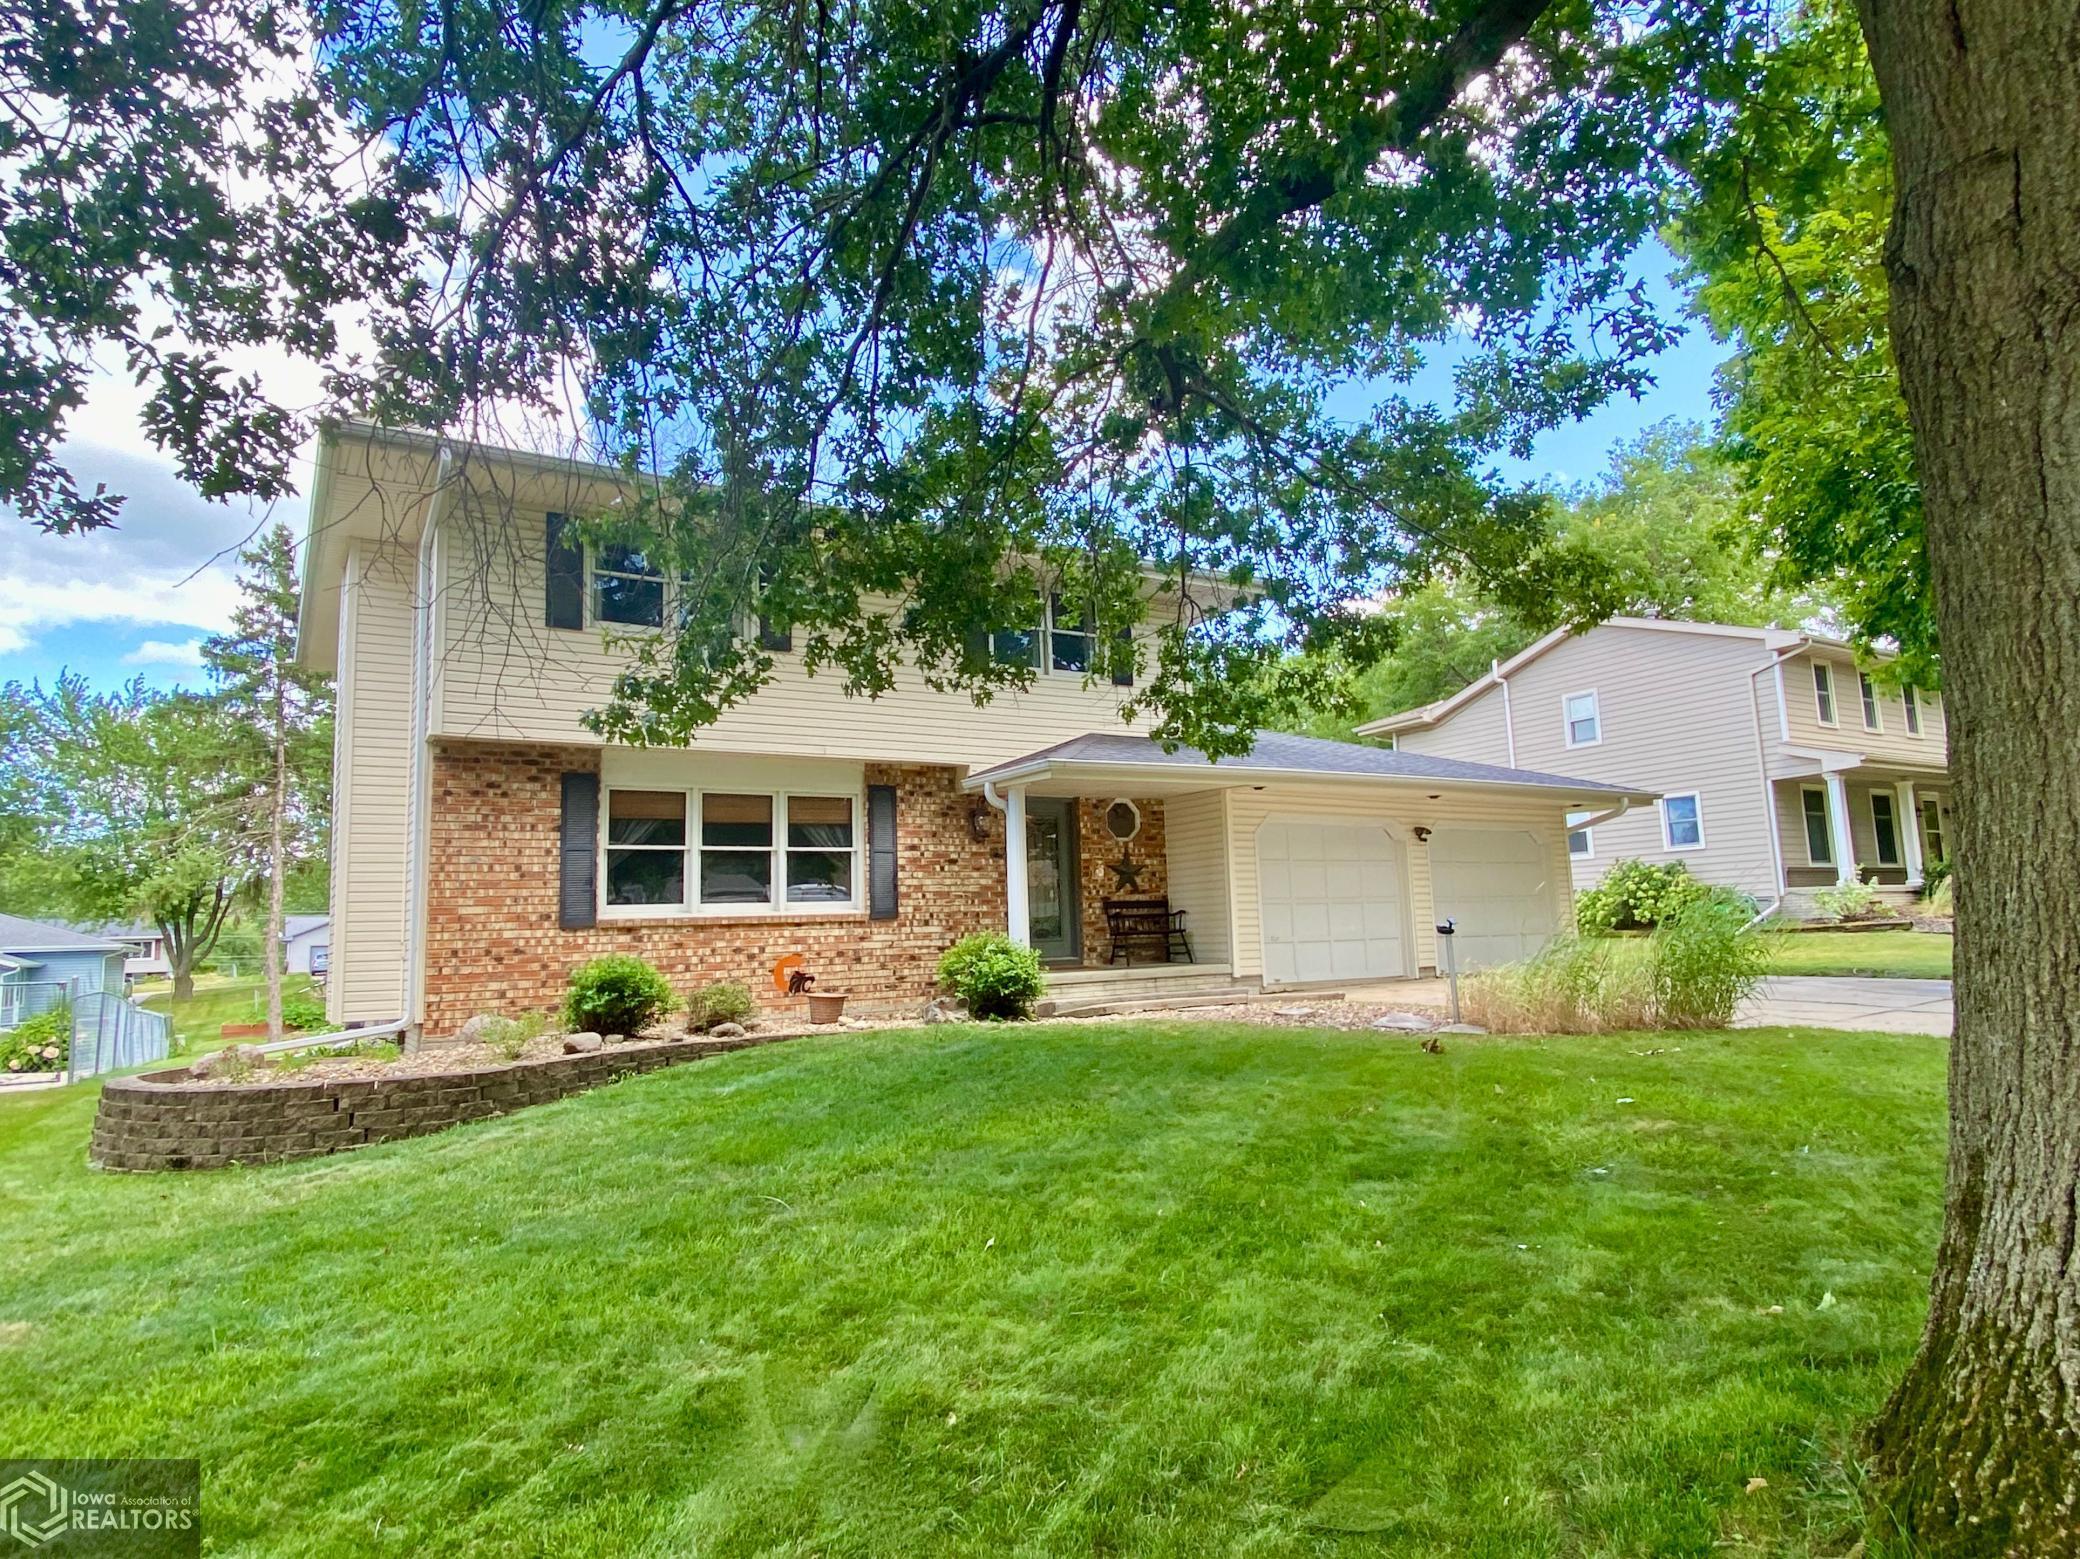 1828 Prairie, Grinnell, Iowa 50112-1022, 4 Bedrooms Bedrooms, ,1 BathroomBathrooms,Single Family,For Sale,Prairie,5699786